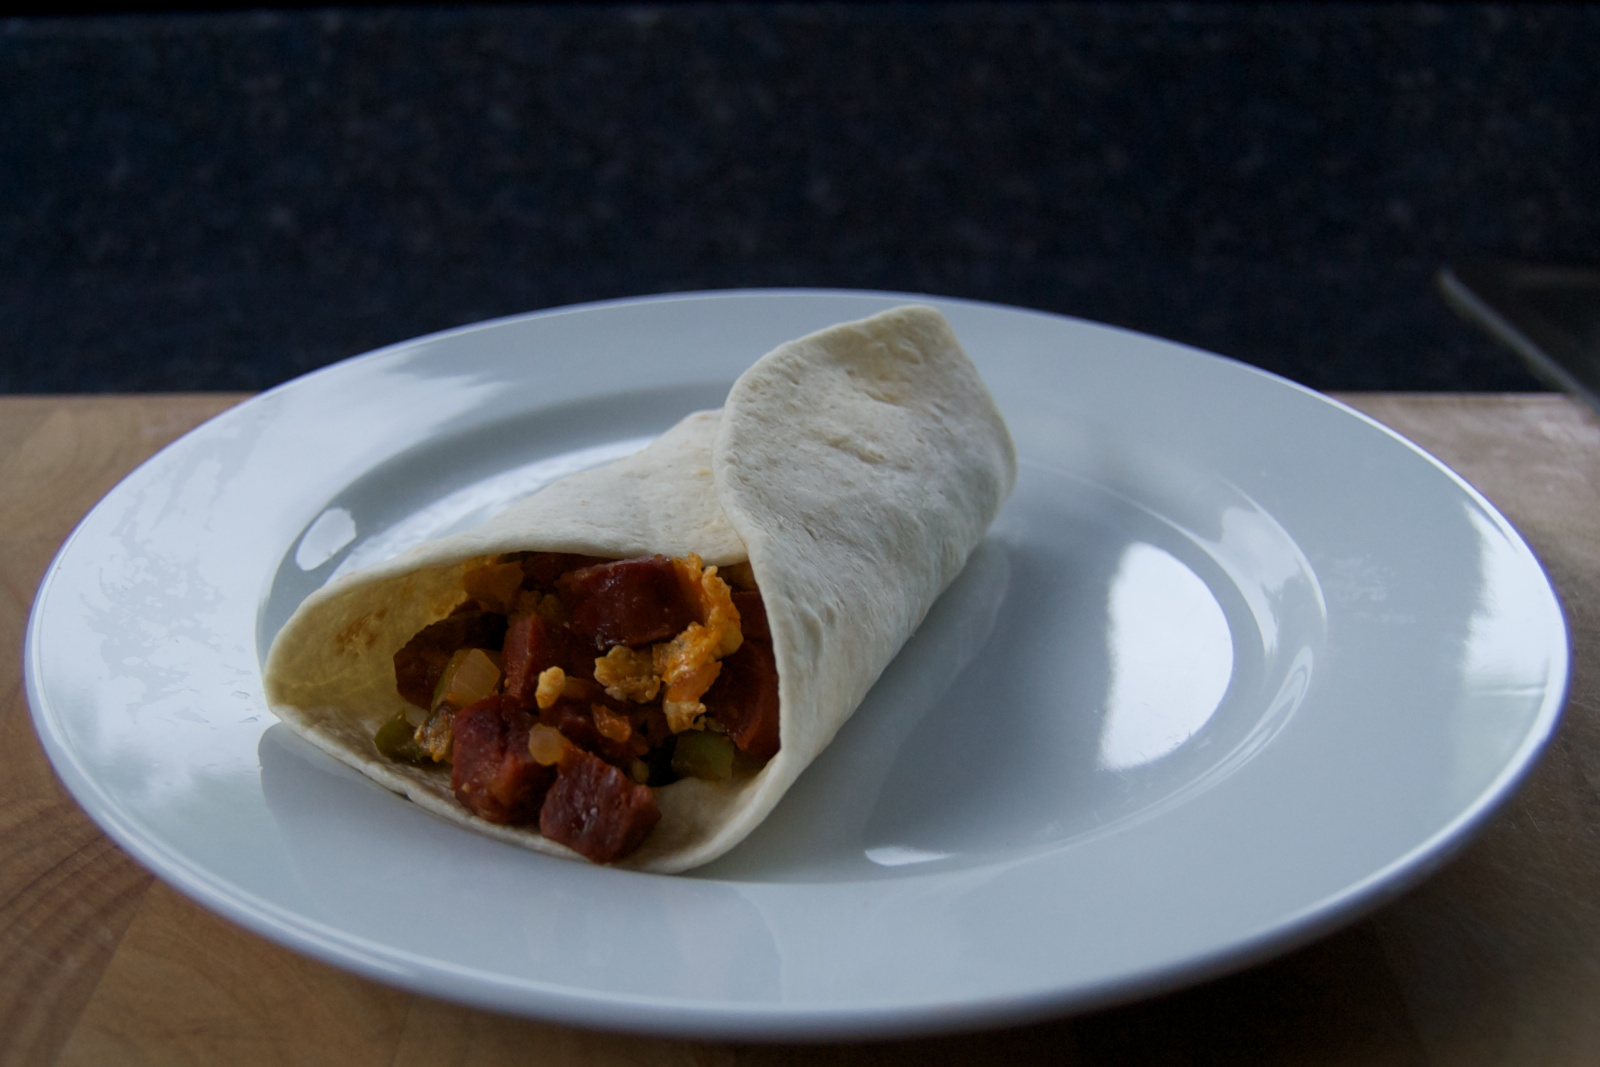 http://blog.rickk.com/food/2012/06/09/ate.2012.06.09.b.jpg